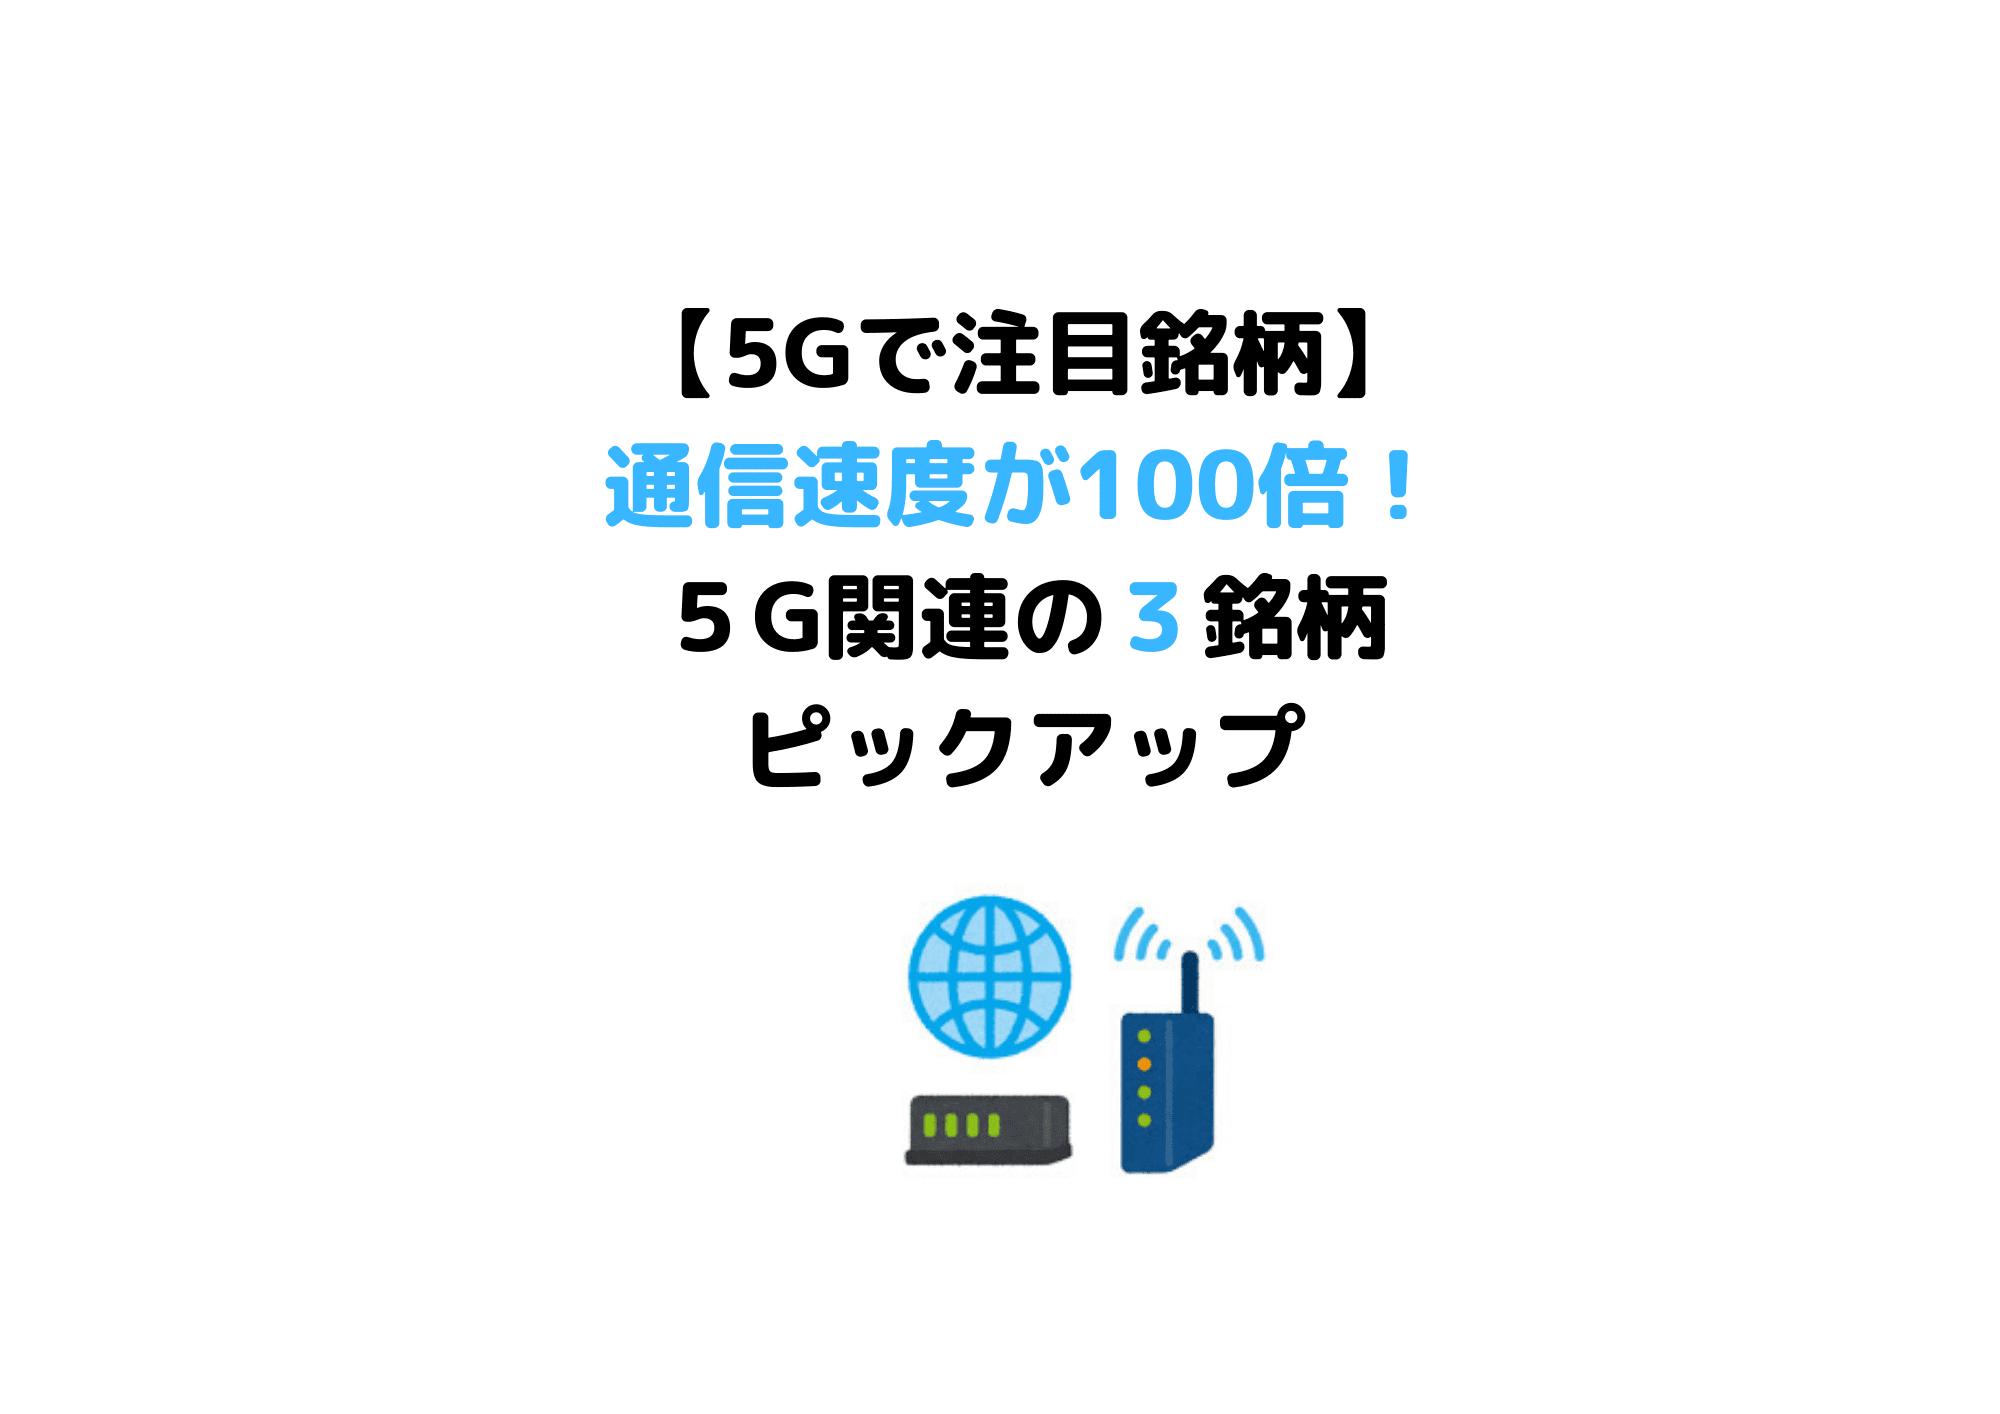 5G (1)